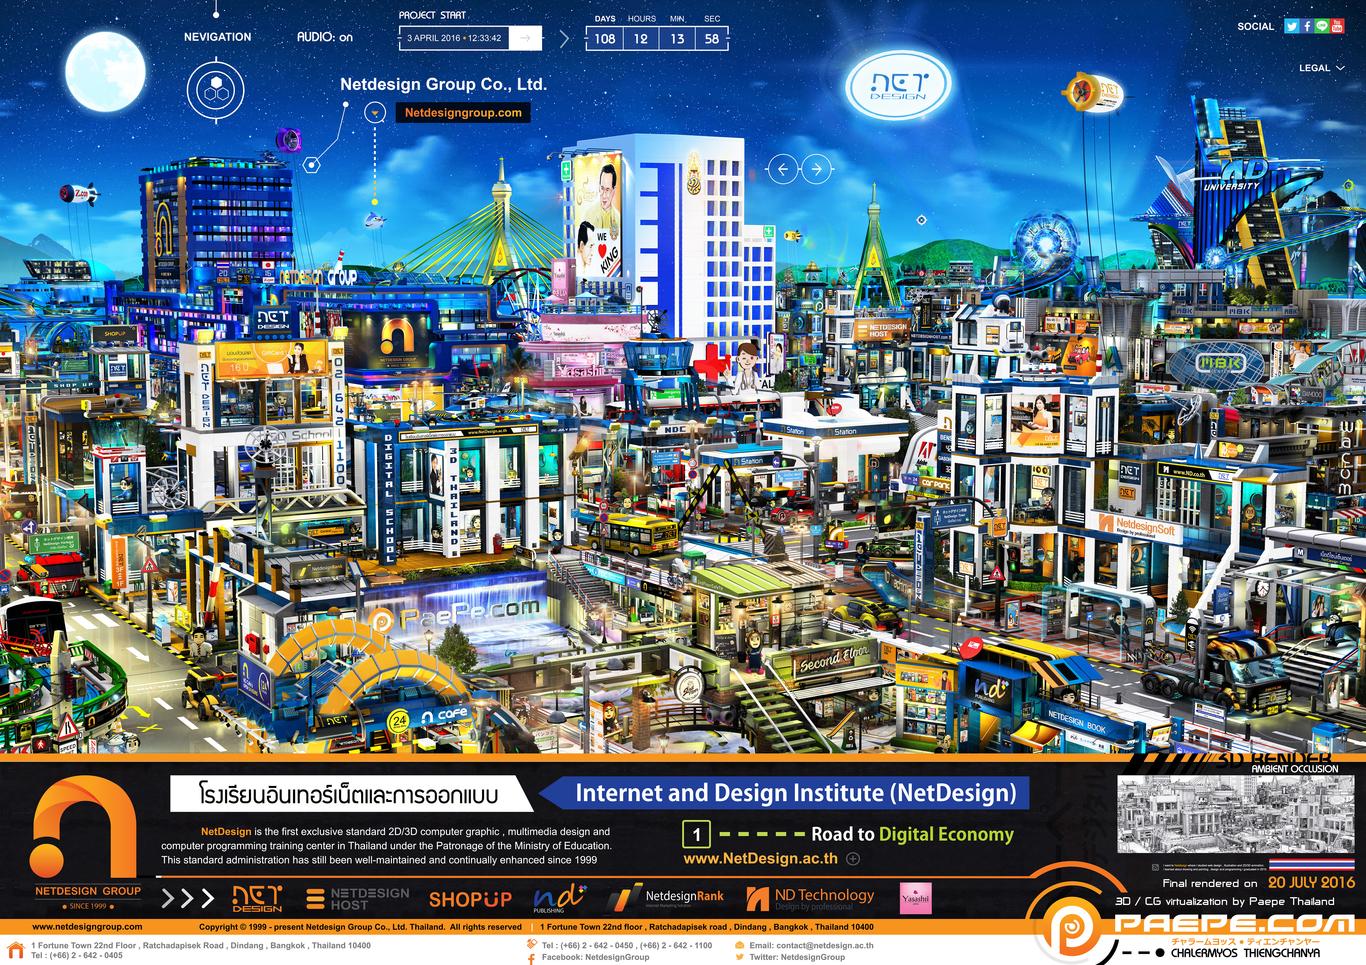 Paepe netdesign city 2016 1 93ce5ec6 xrqb